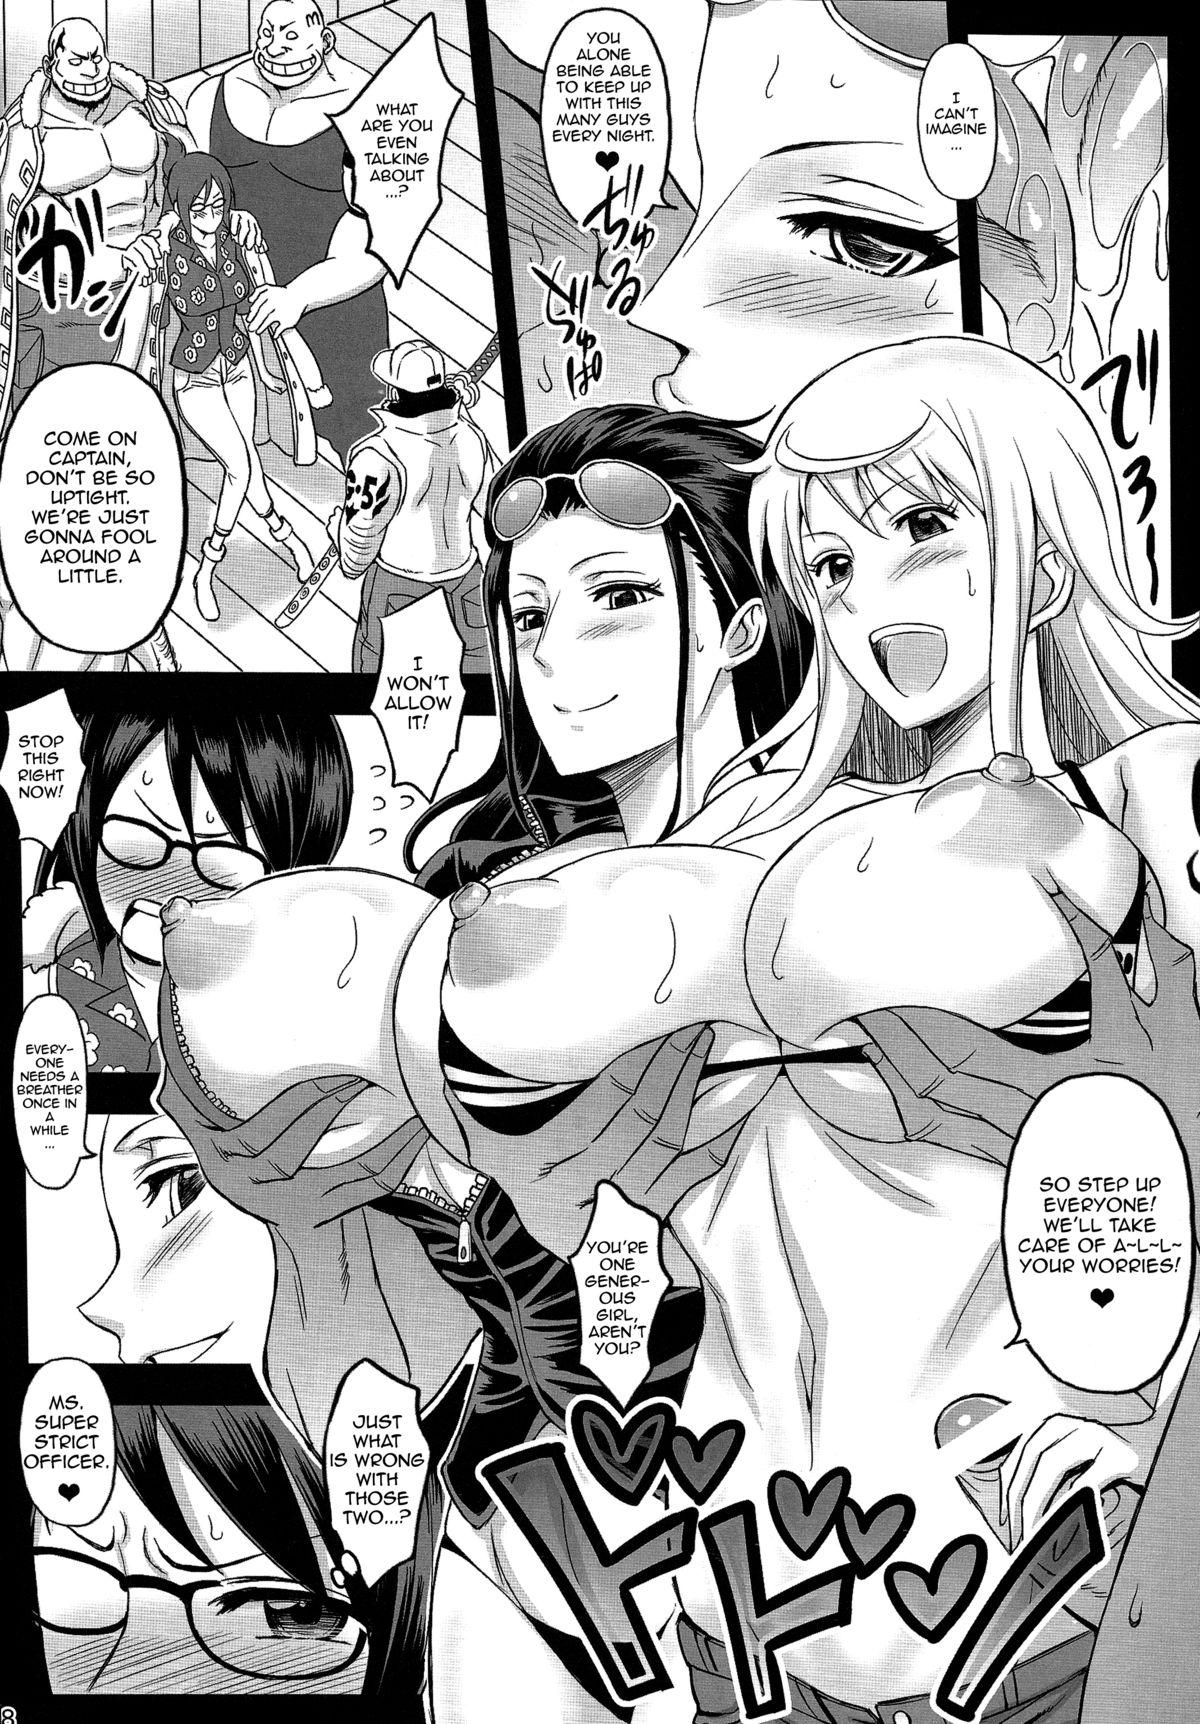 Rakuen Onna Kaizoku 3 - Woman Pirate in Paradise 6